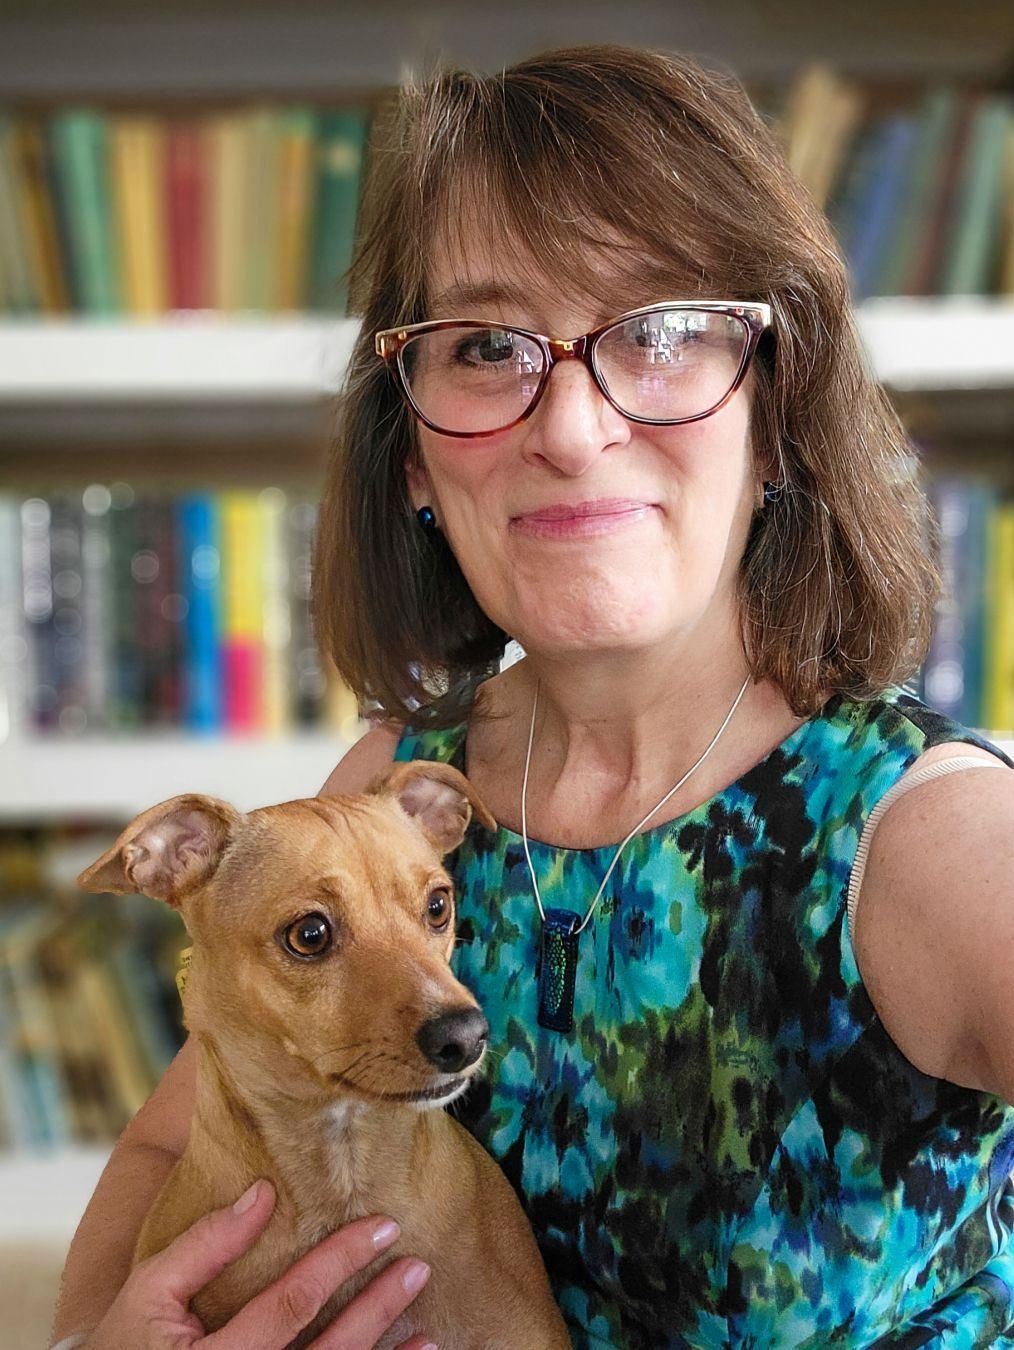 Margaret Park Bridges - Copy Editor